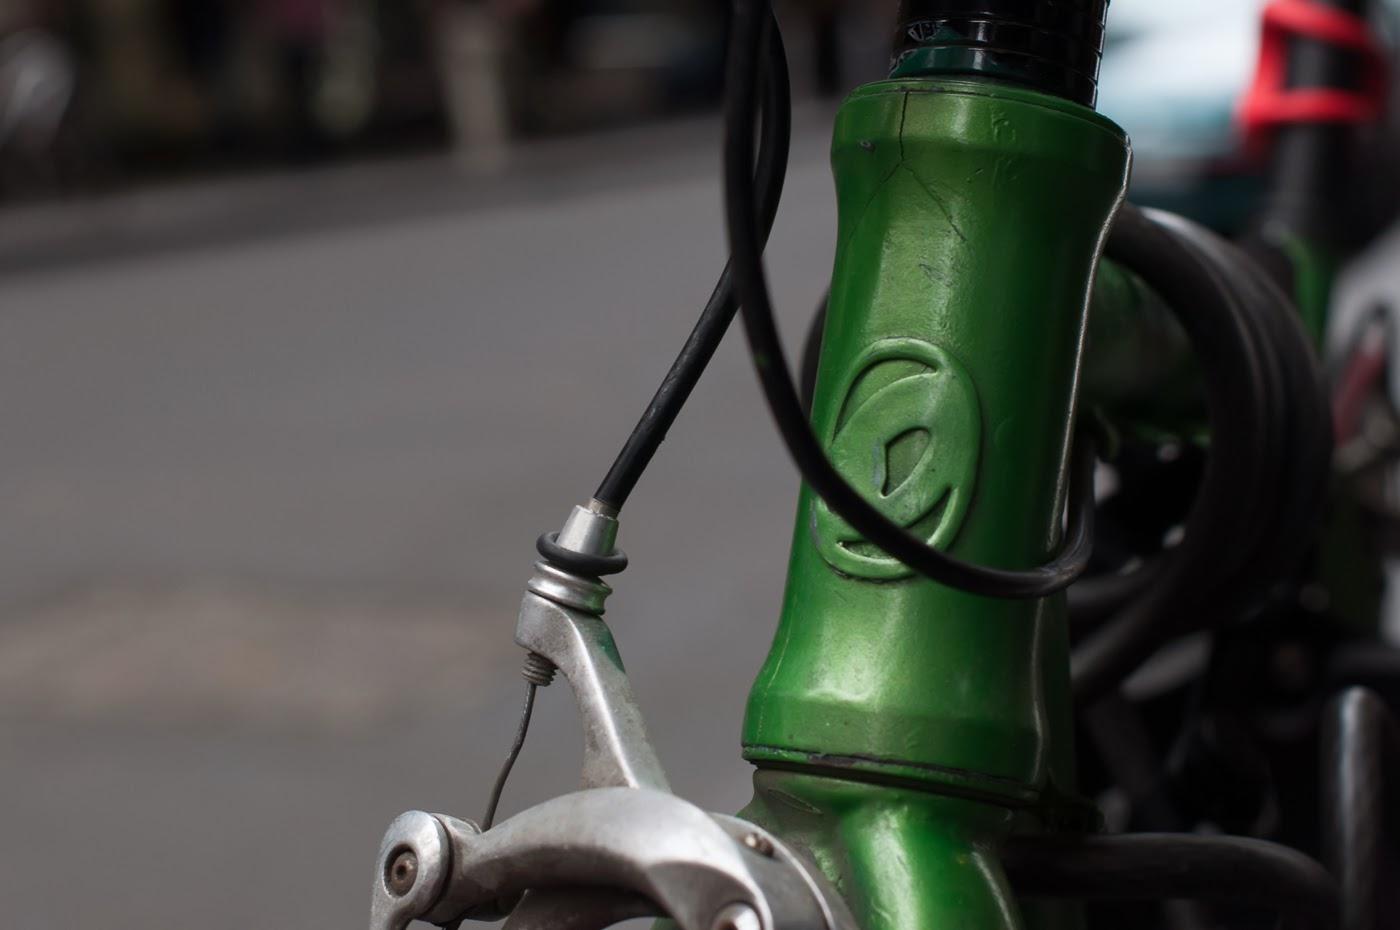 single speed, bike, bicycle, tim macauley, the biketorialist, melbourne, conversion, chain, tensioner road bike, head badge, logo